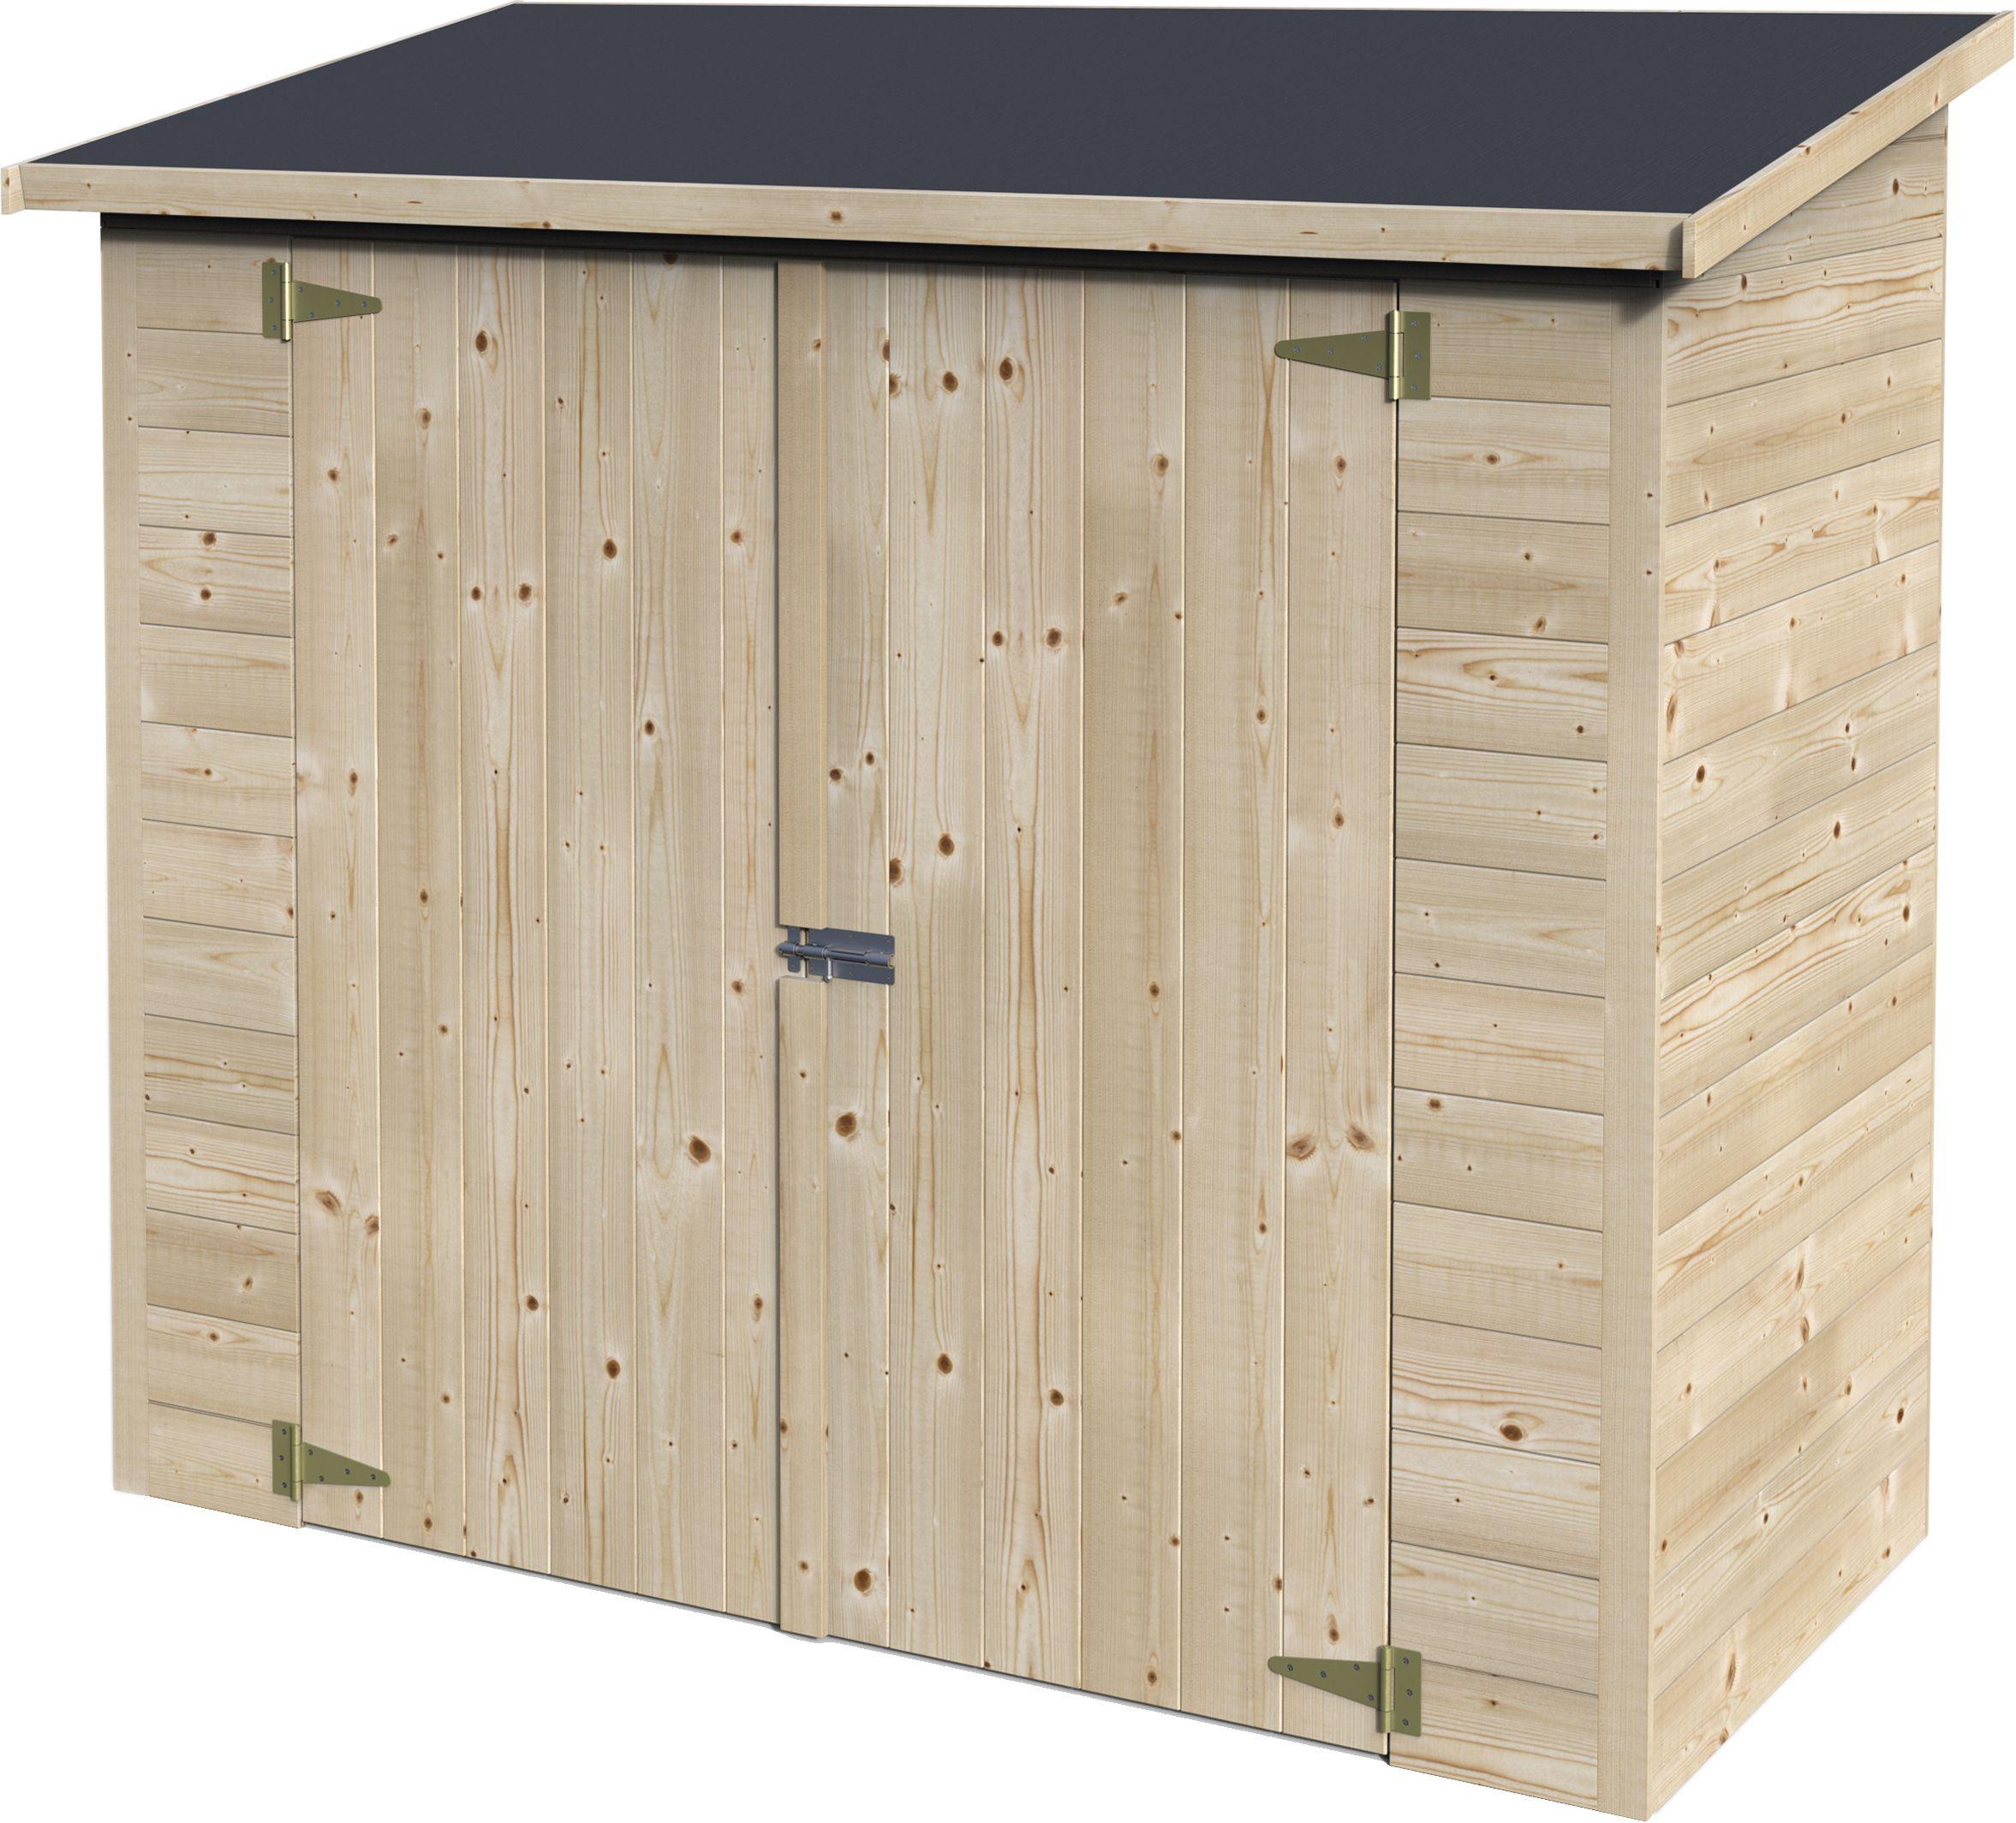 Aki bricolaje jardiner a y decoraci n armario madera box for Armario madera jardin